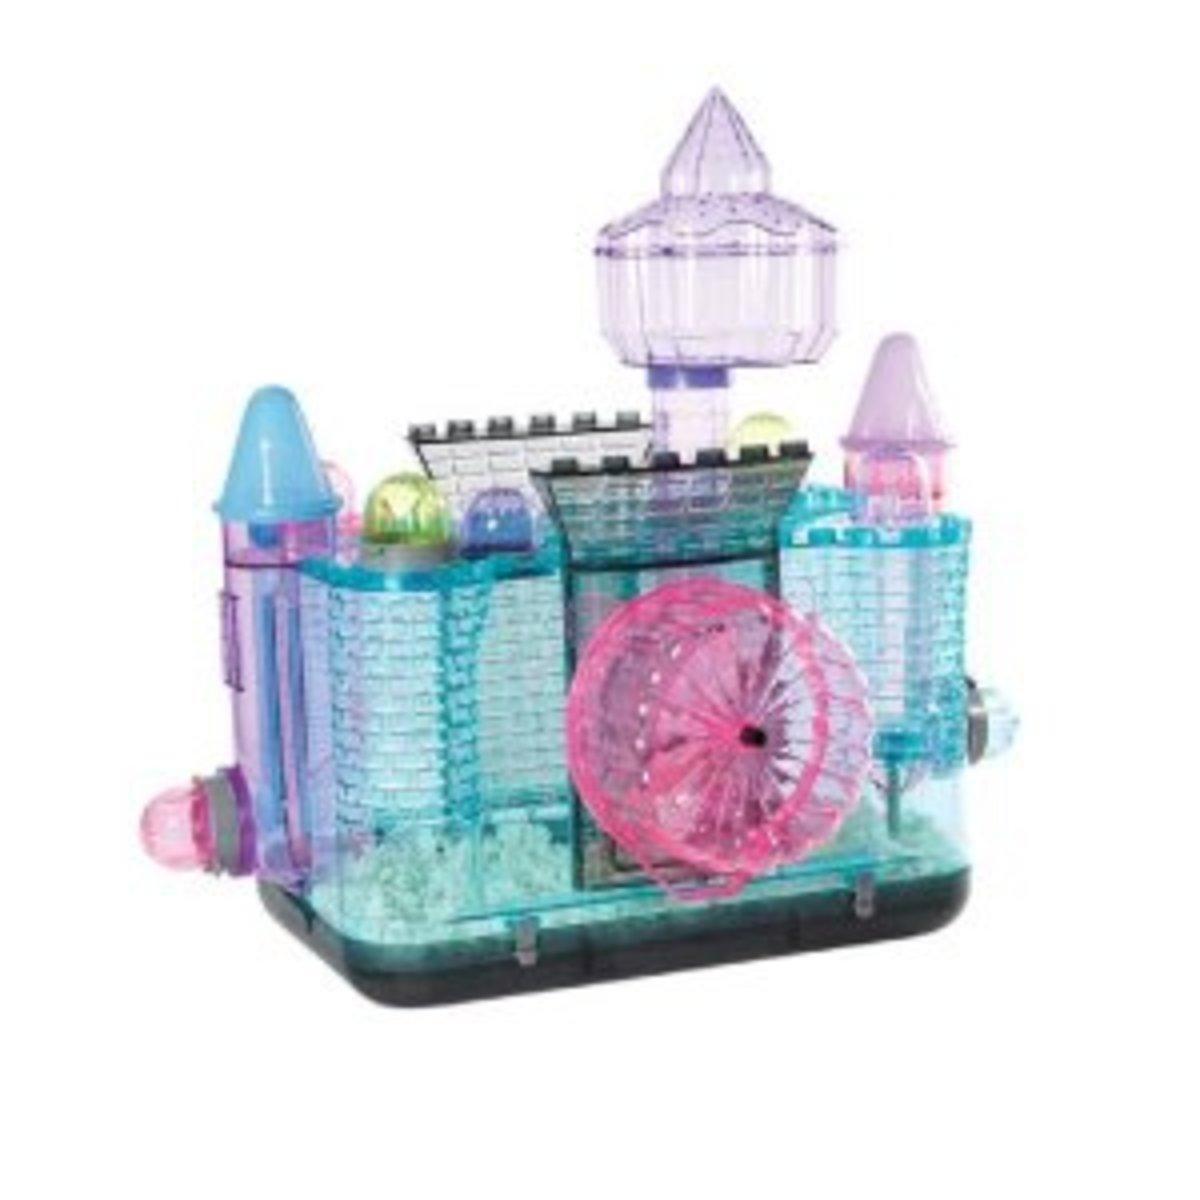 Cool Hamster Cage Biddie Buddies Palace